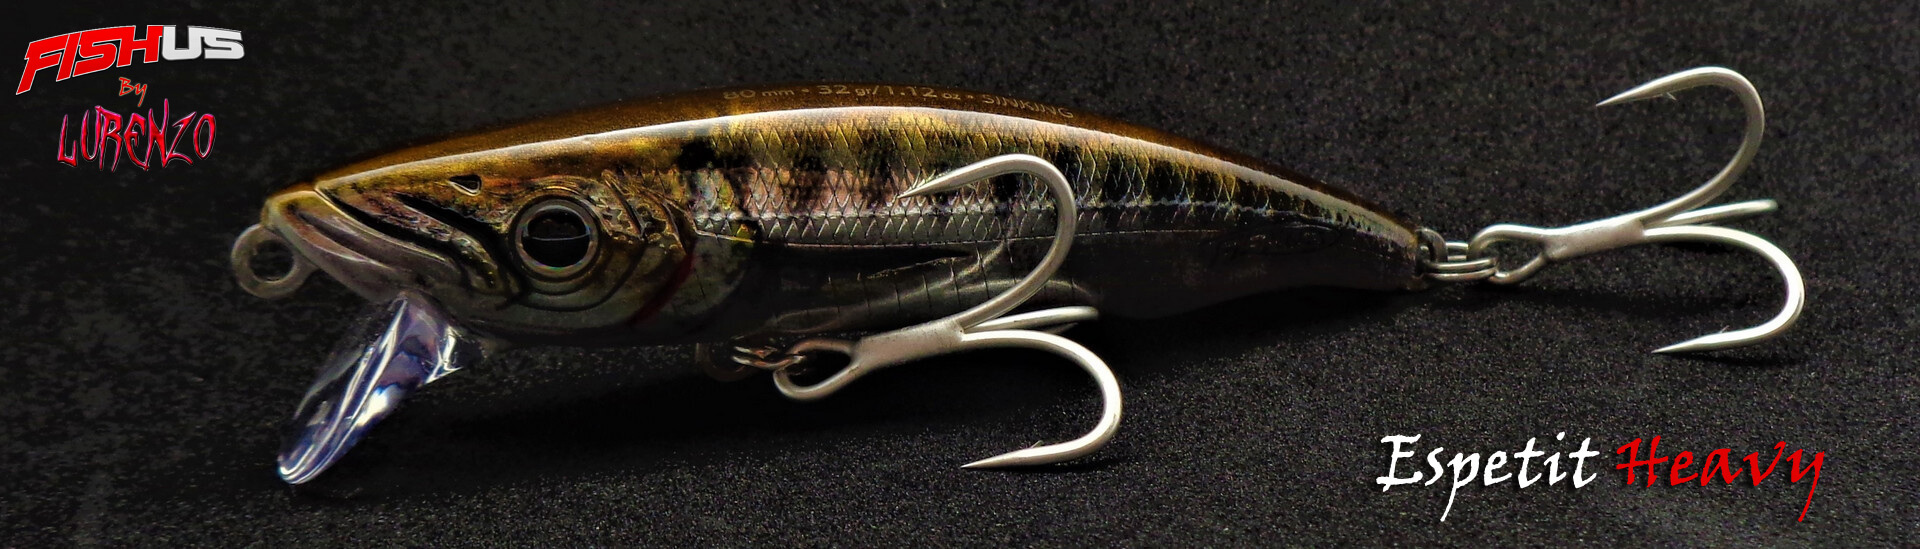 Fishus By Lurenzo Espetit Heavy